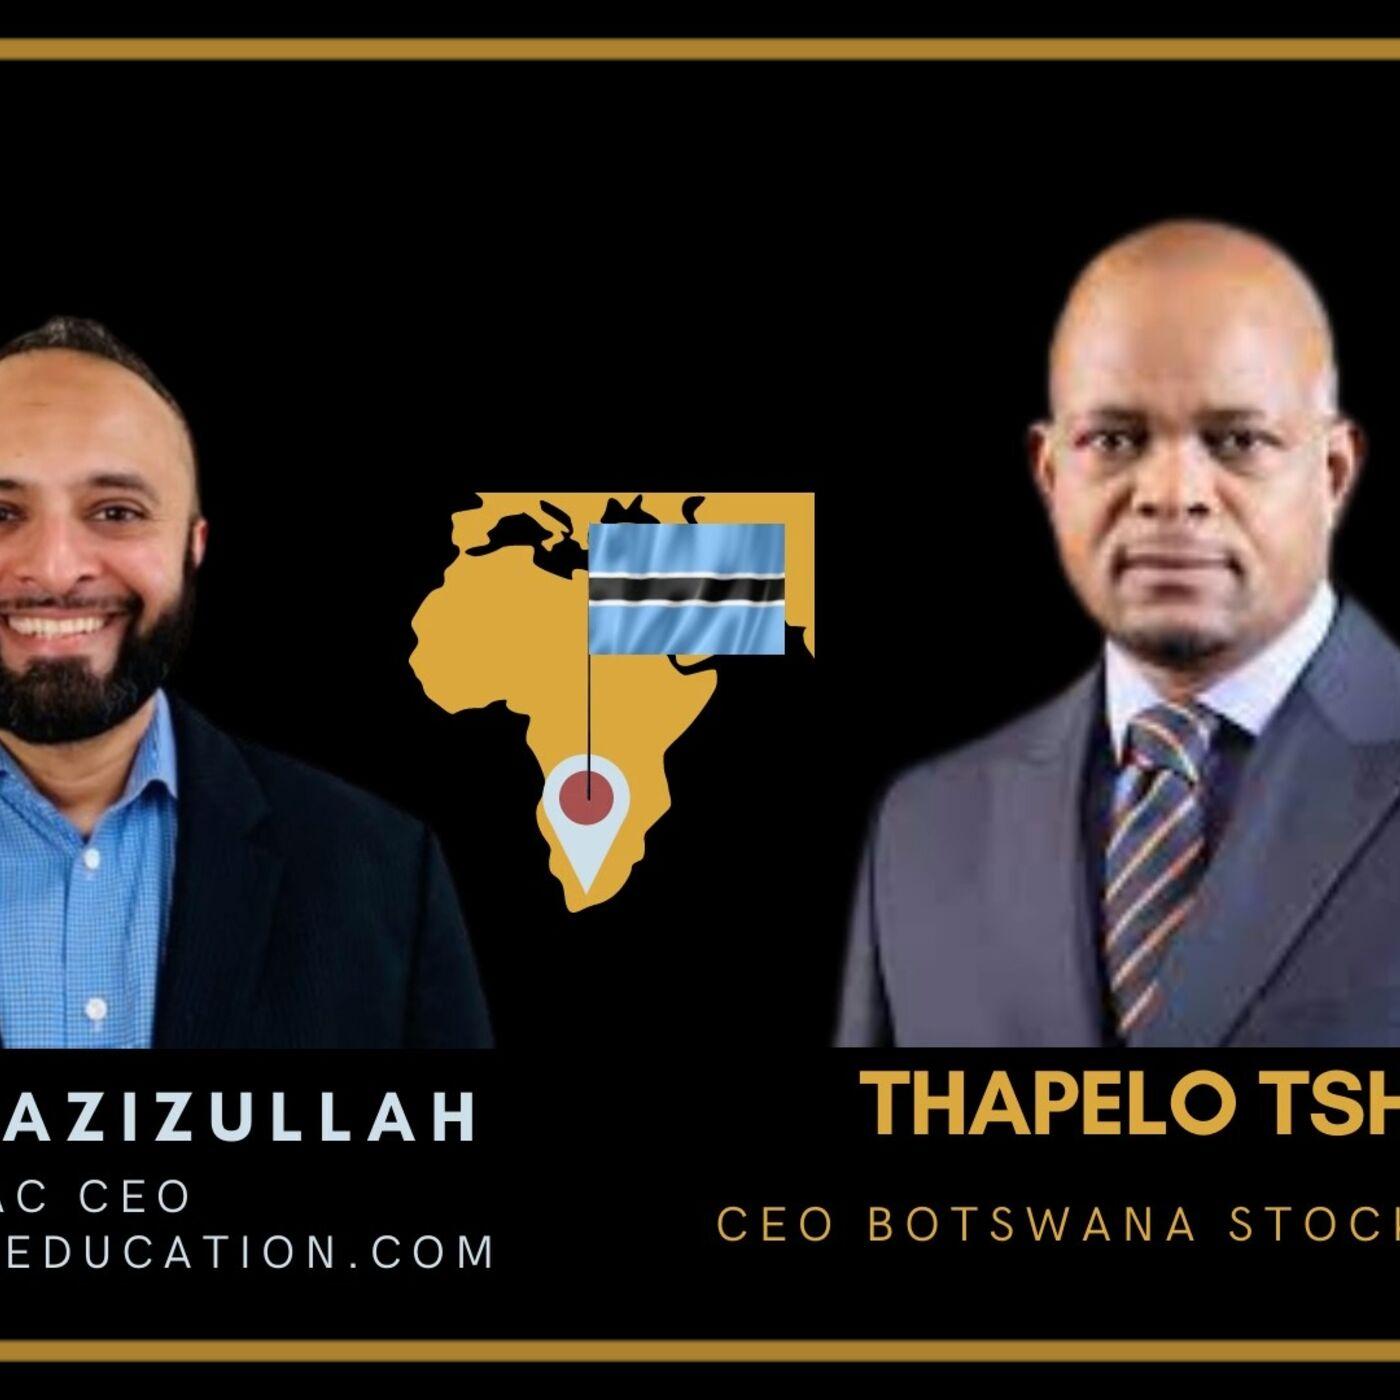 Yusuf Azizullah GBAC Boardroomeducation.com CEO and Botswana Stock Exchange CEO Thapelo Tsheole